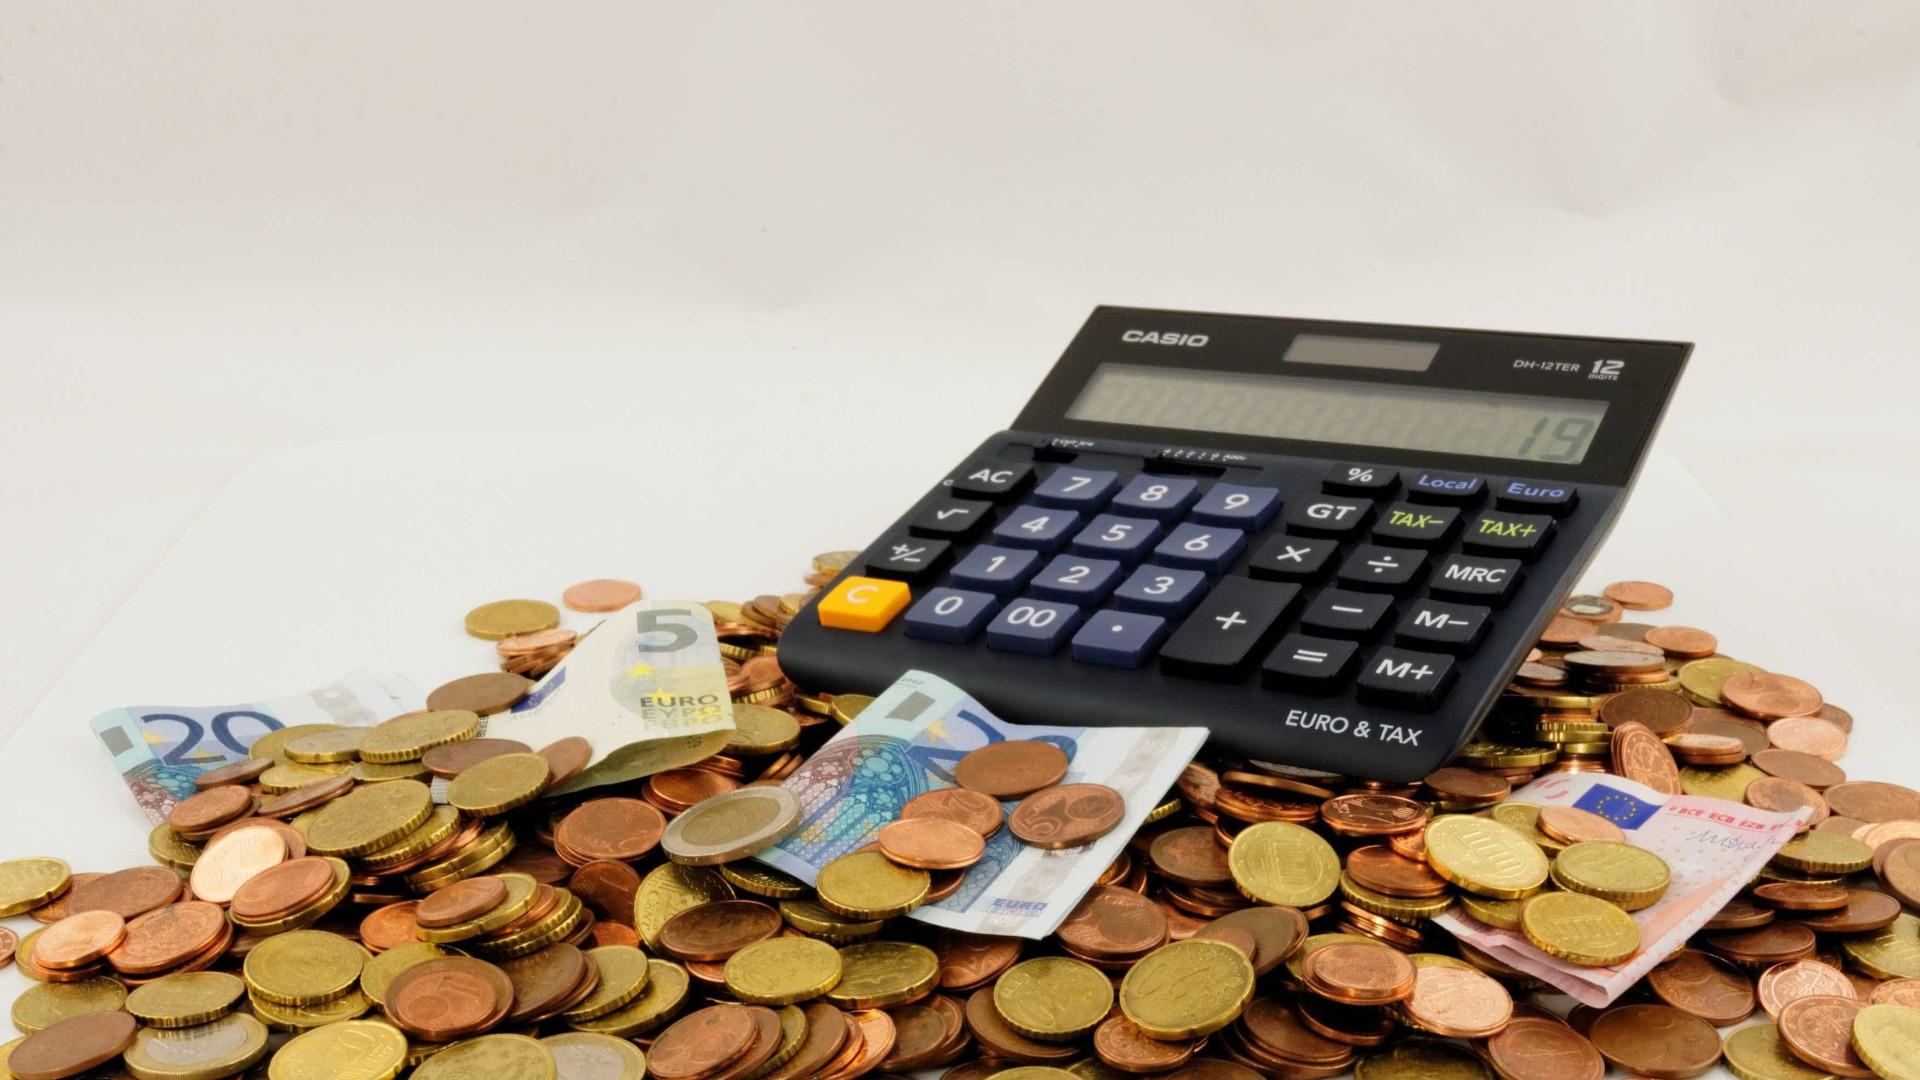 Défice atinge 1,9% do PIB sem medir impacto da CGD